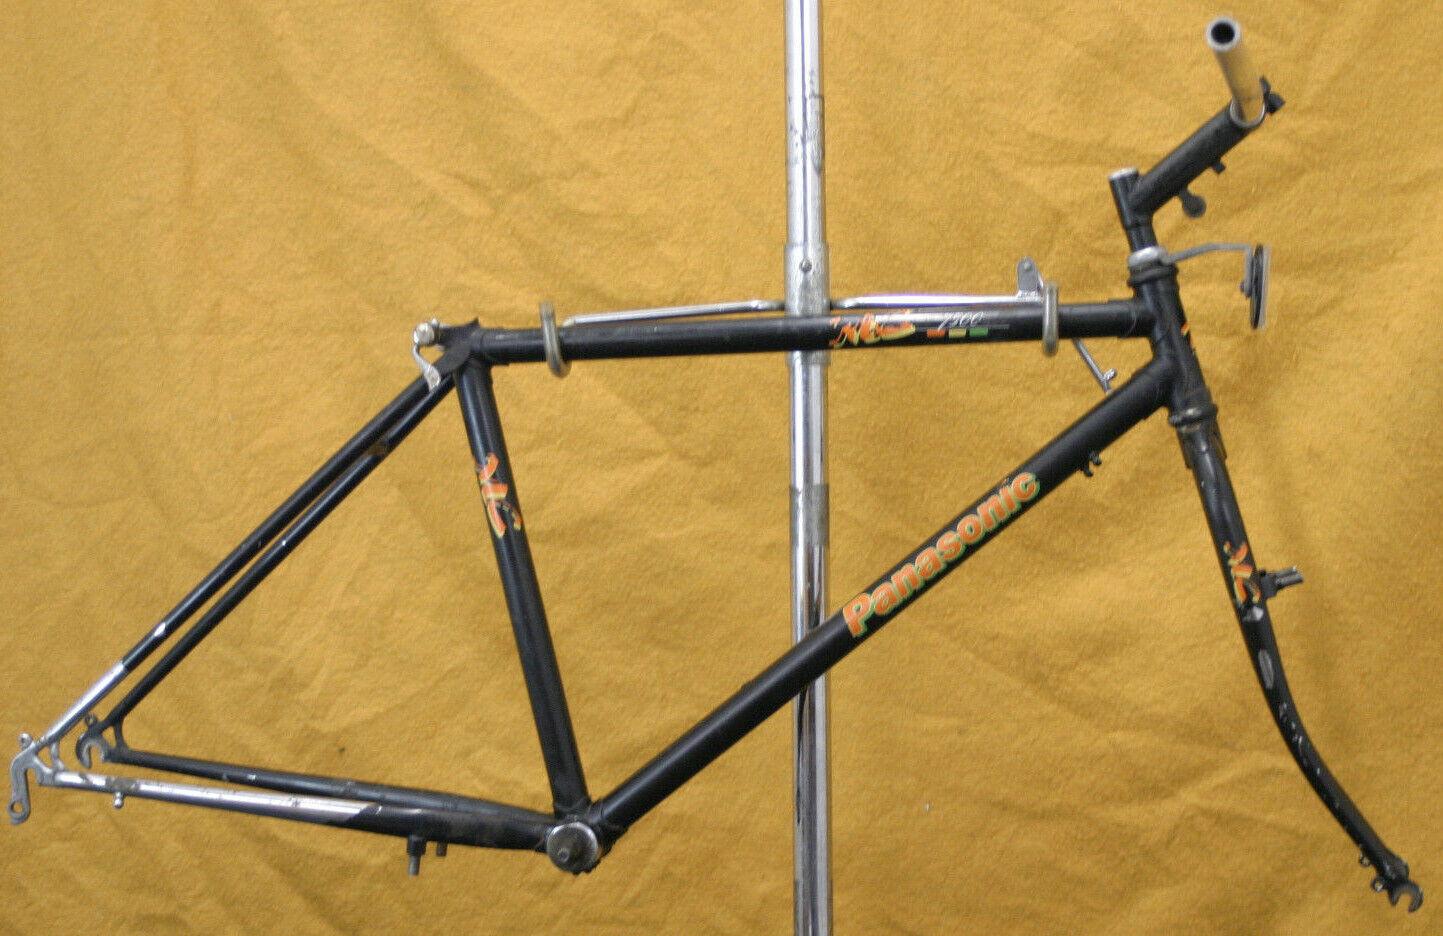 Panasonic MC-7500 Vintage Cuadro para Bicicleta de montaña 16  U-Freno Touring Rasta obras benéficas.